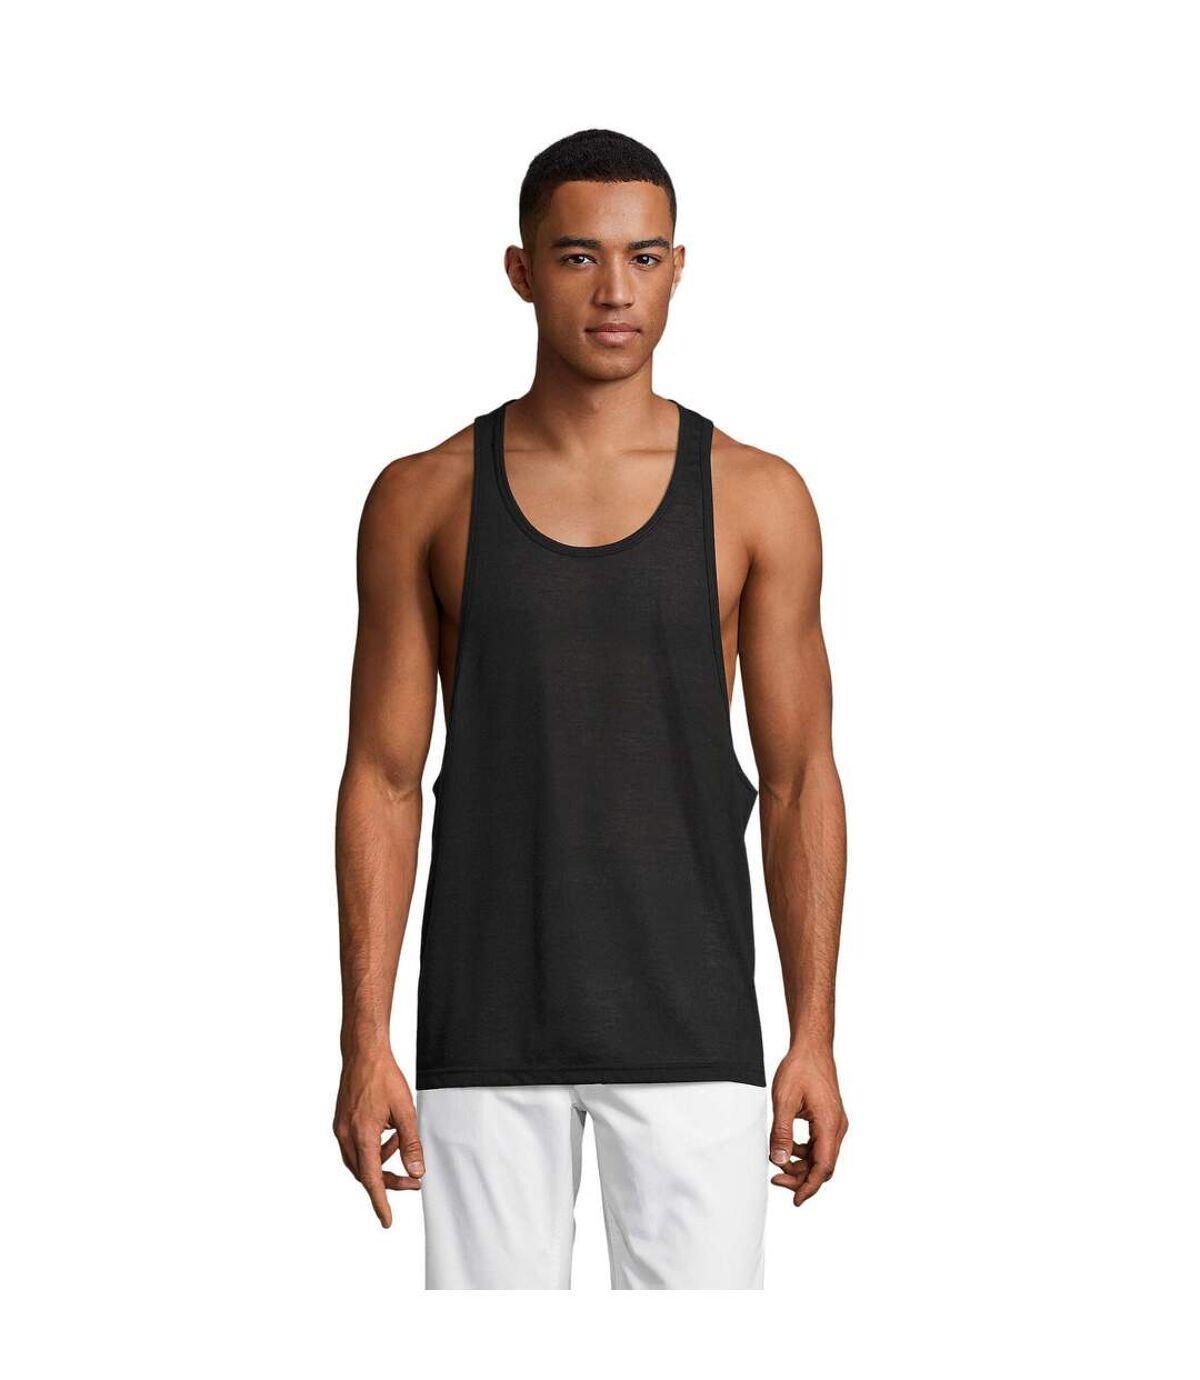 SOLS Unisex Jamaica Sleeveless Tank / Vest Top (Black) - UTPC2179